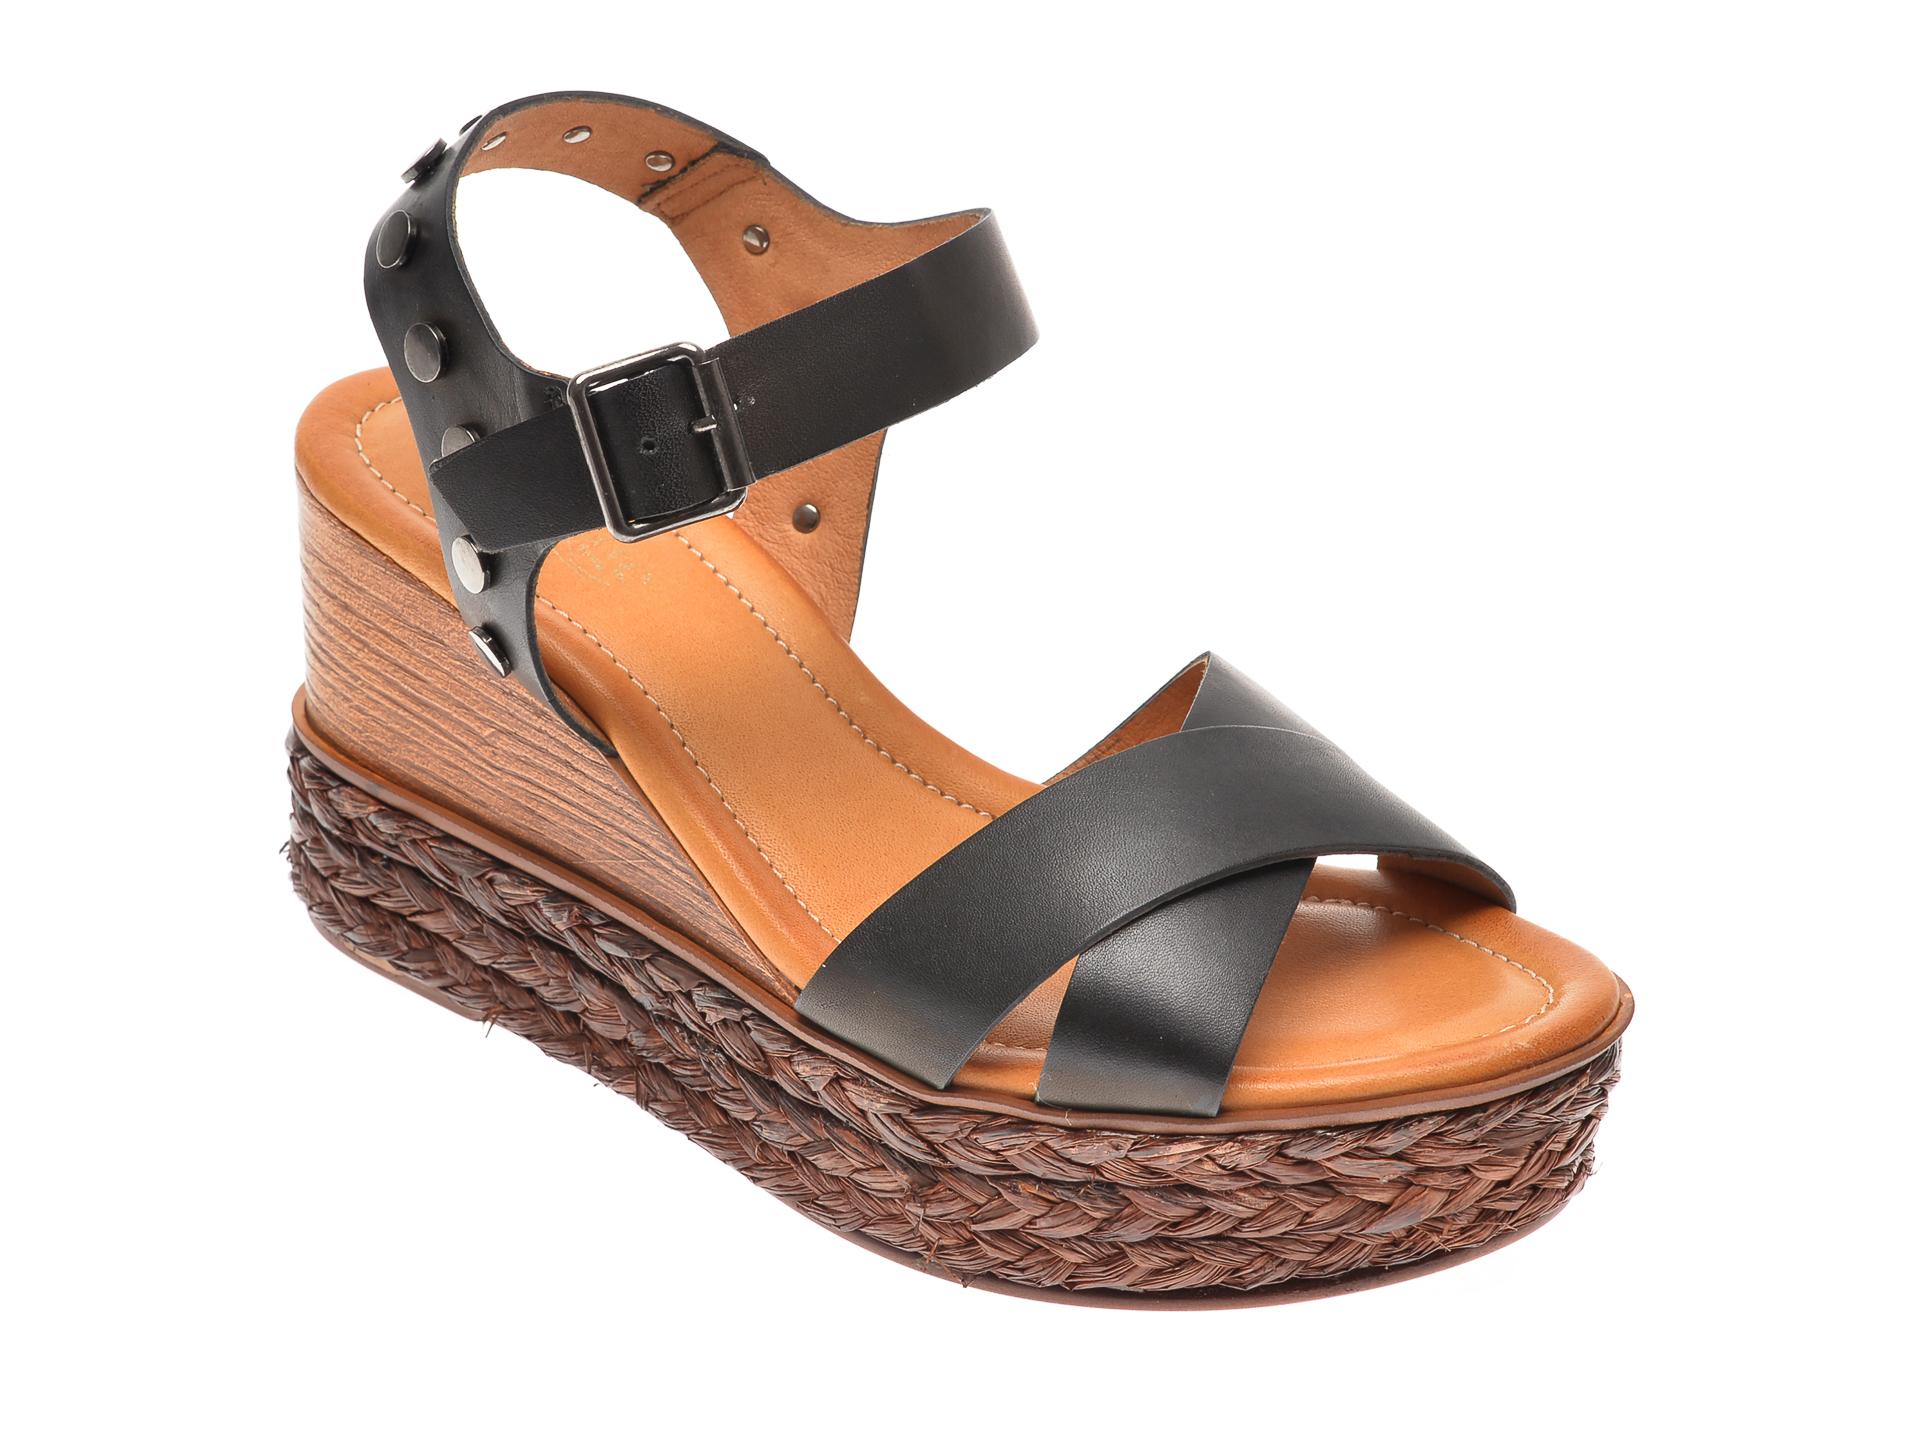 Sandale Image Negre, 4147, Din Piele Naturala